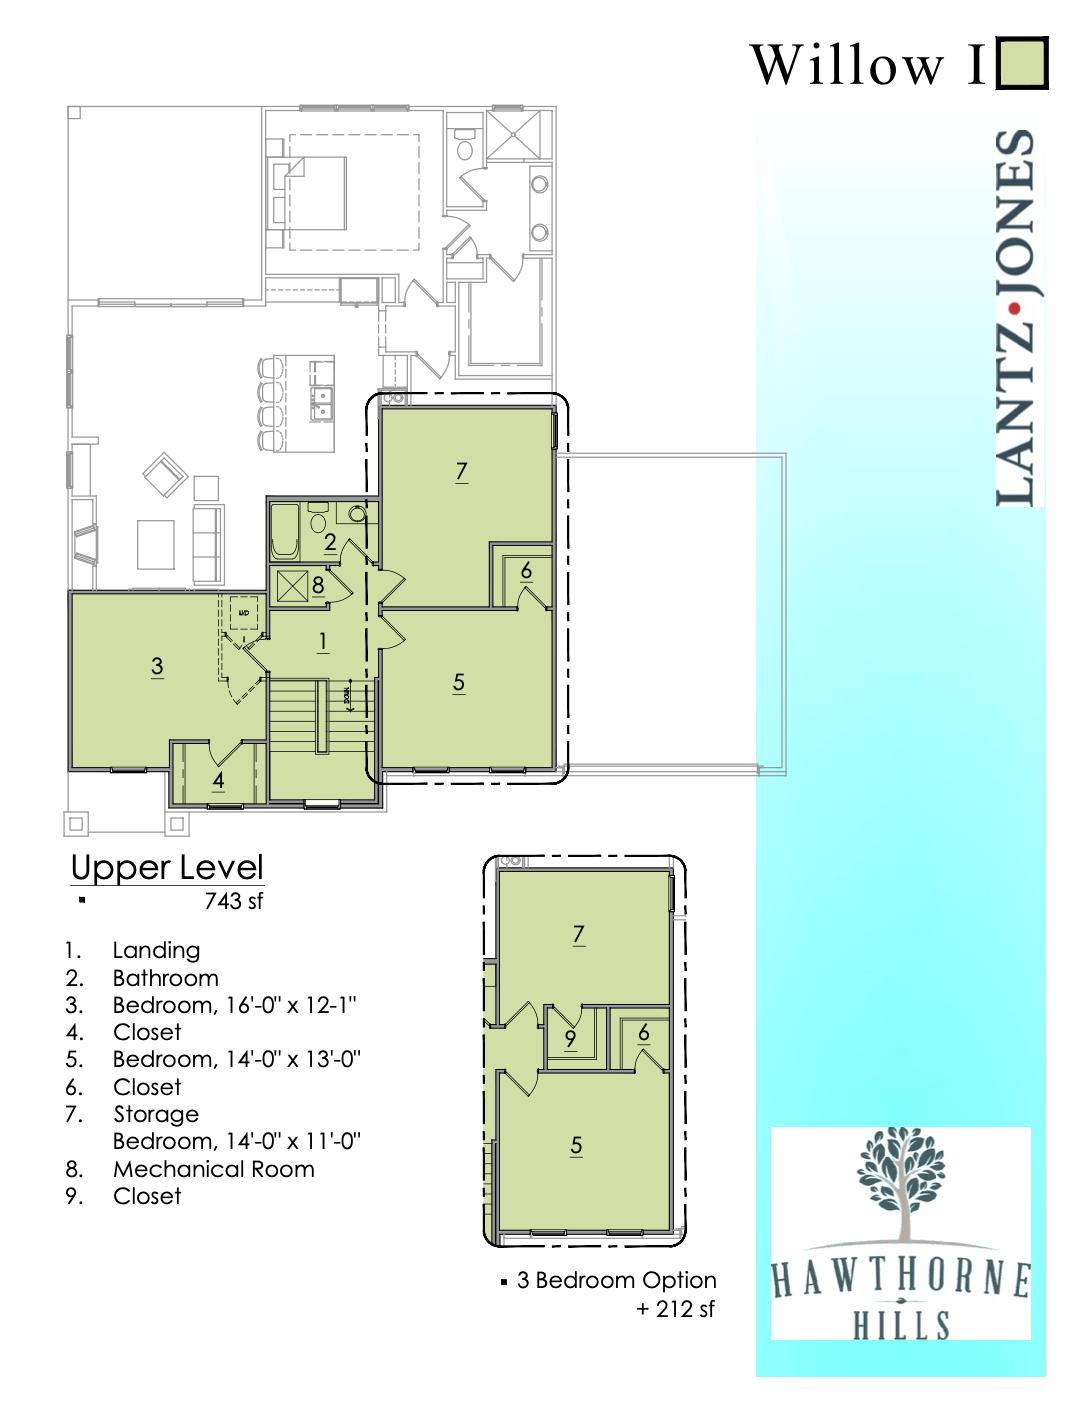 Willow 1 Upper Level